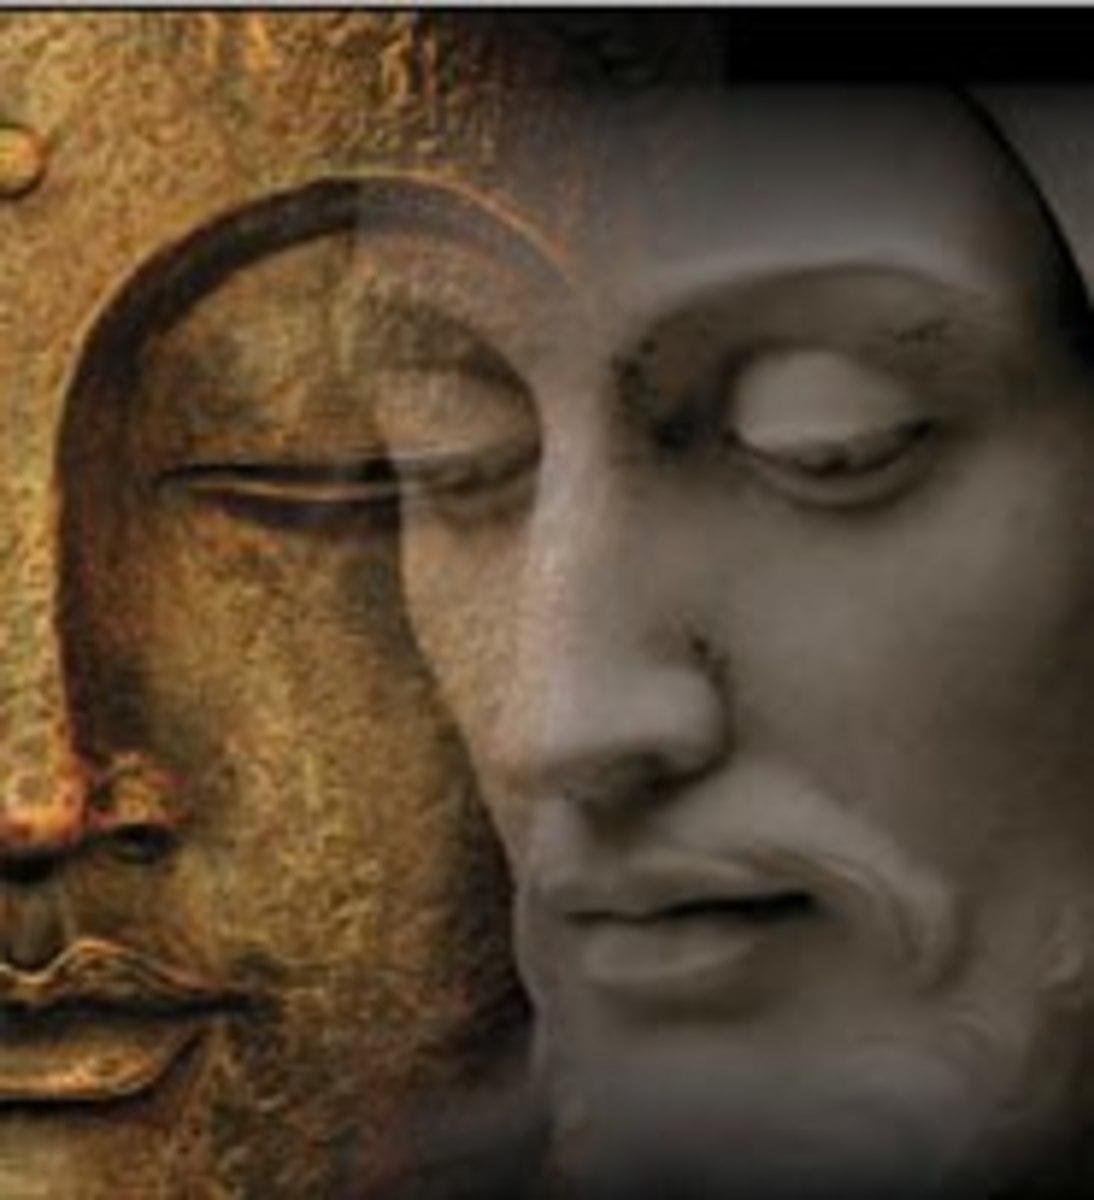 An image of Jesus and Buddha